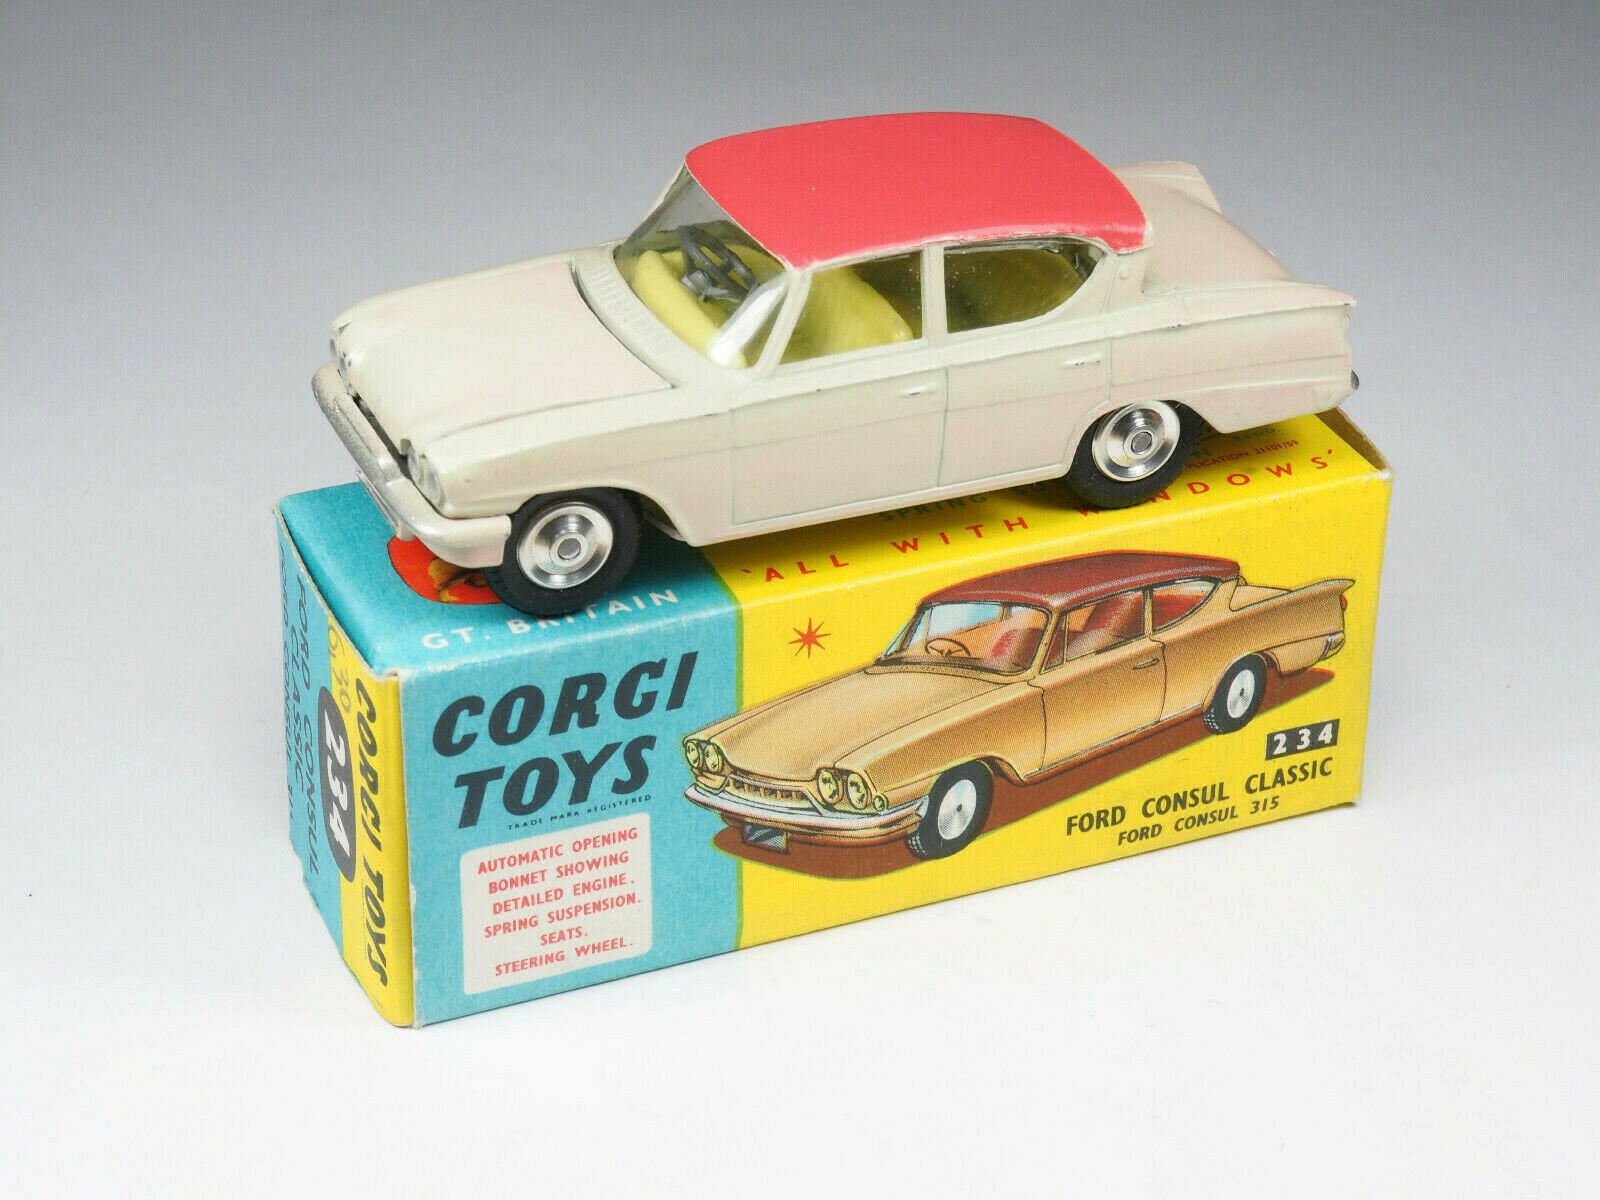 precios bajos Corgi Juguetes - 234 - Ford Consul Classic Classic Classic variation Beige rosé - 1 43e - England  Envio gratis en todas las ordenes